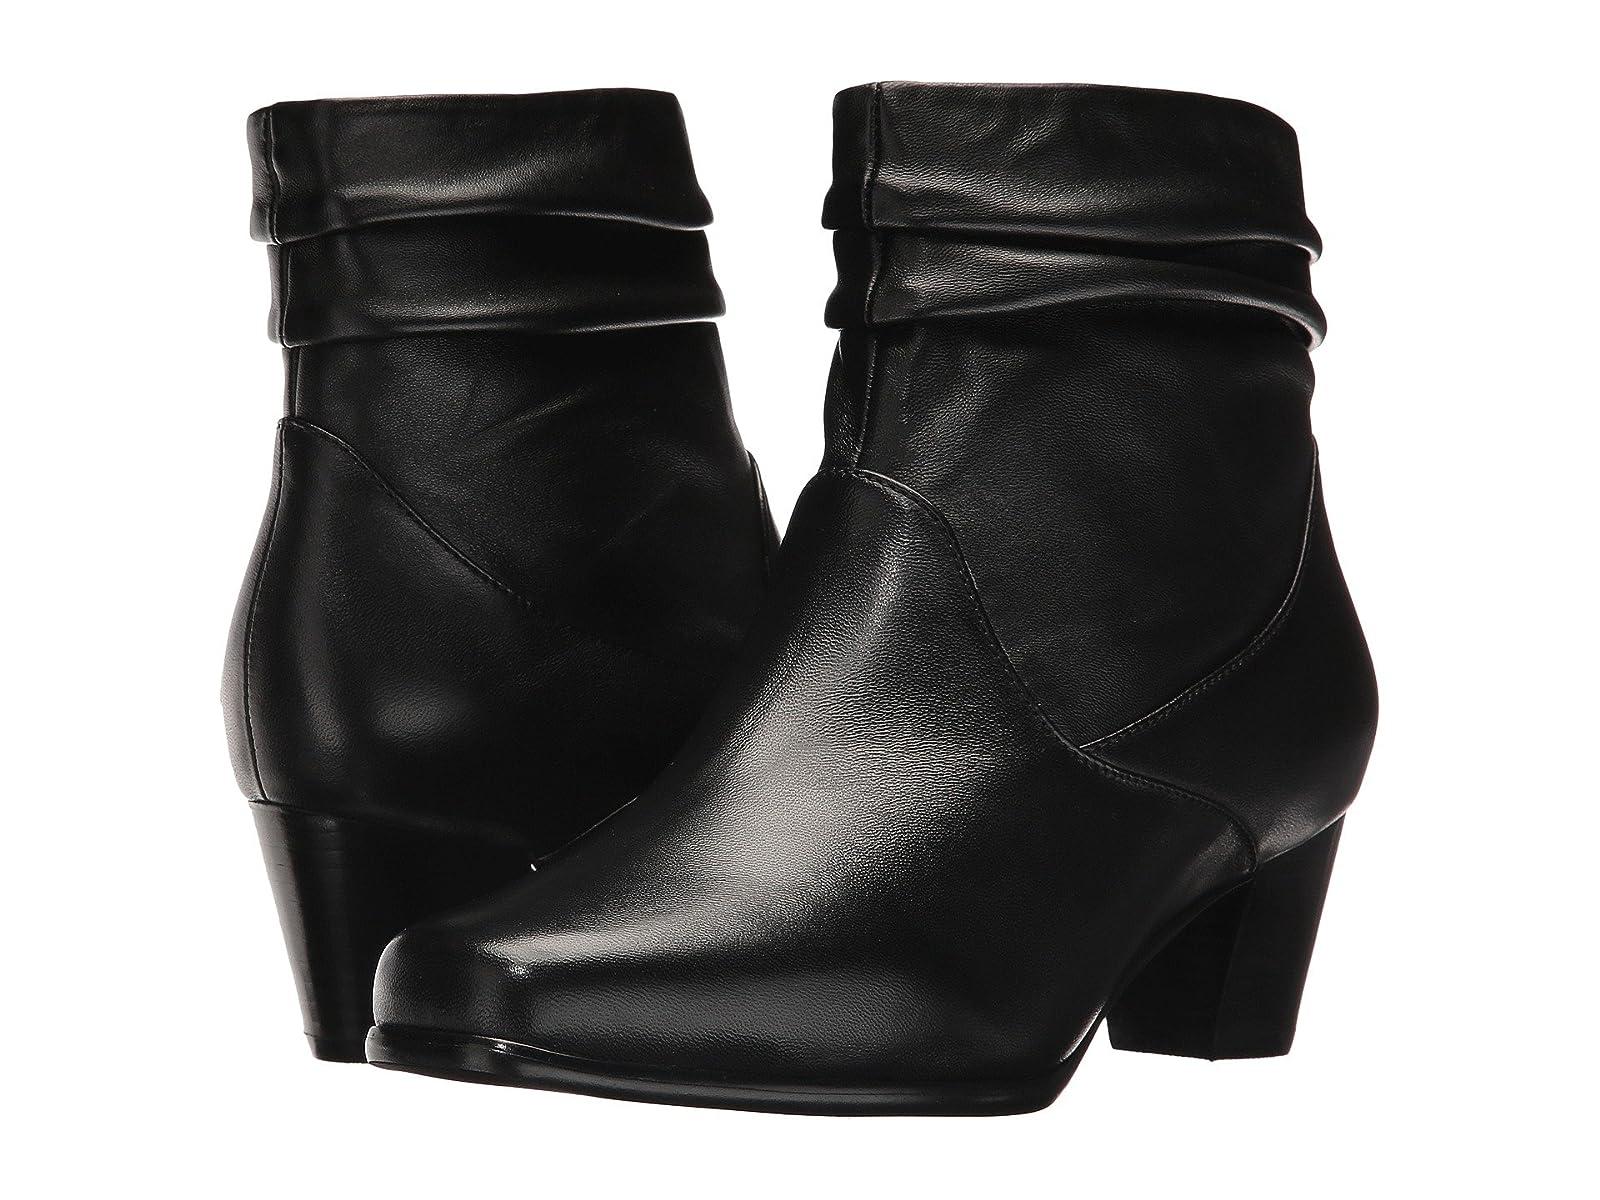 David Tate ShadowAffordable and distinctive shoes